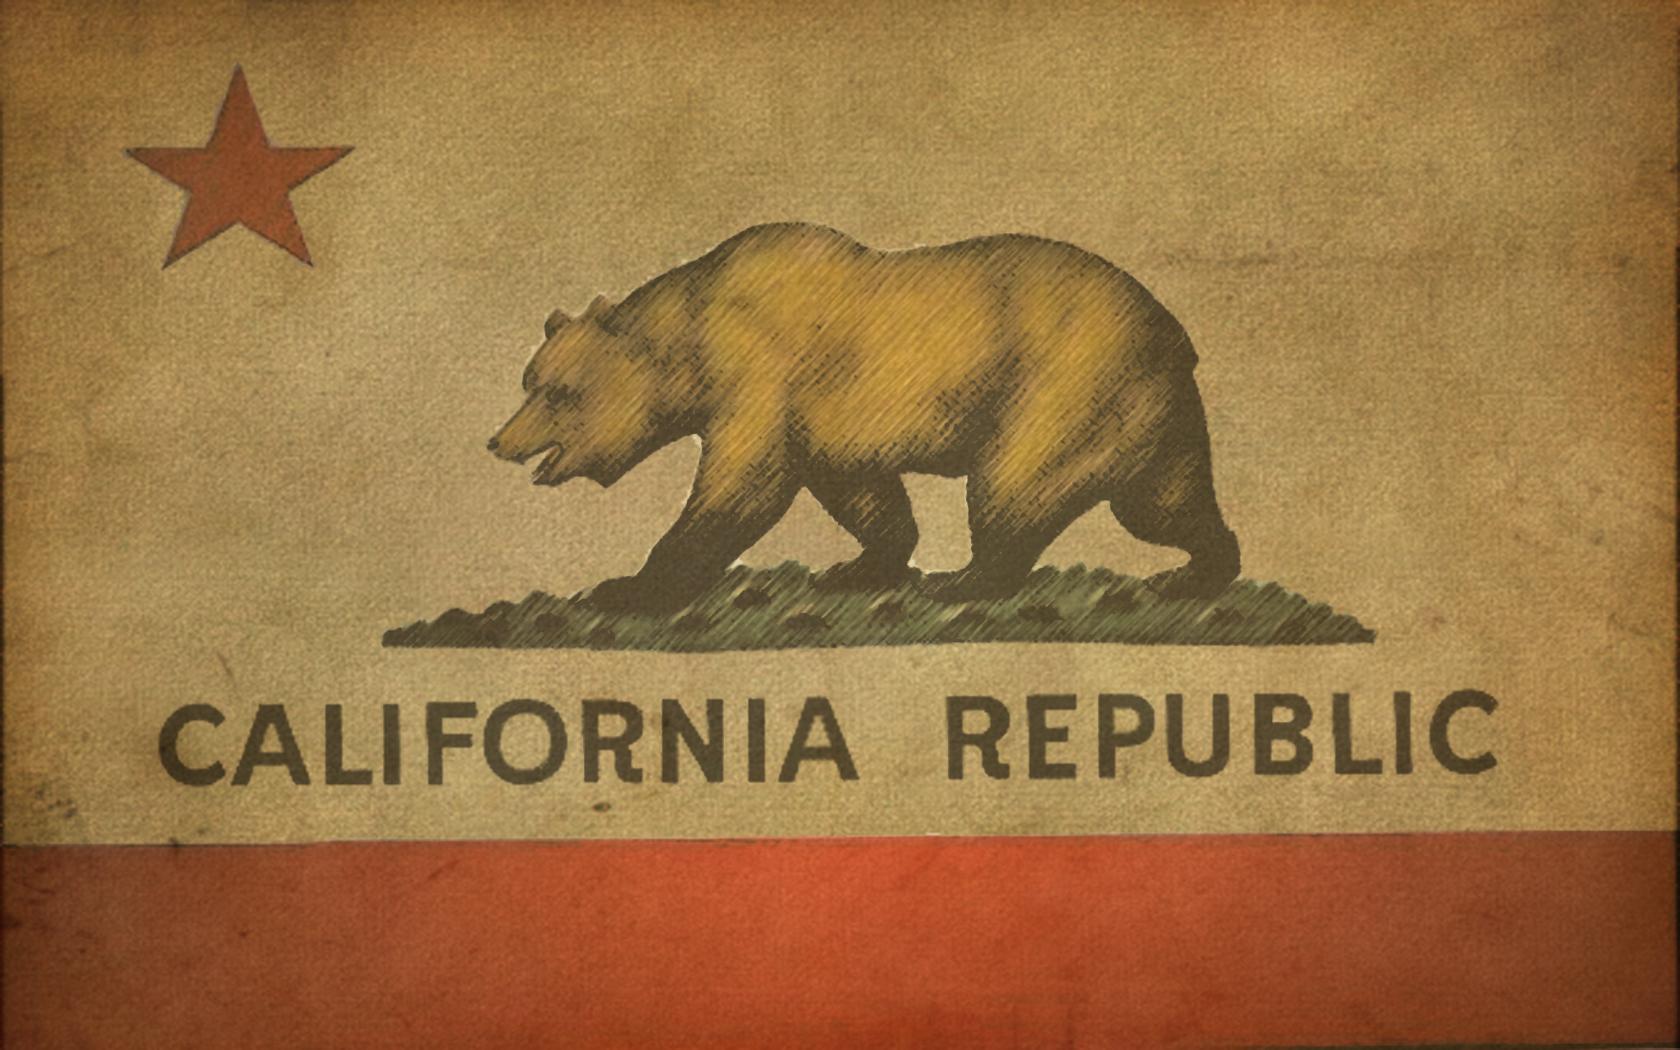 Republic Android Wallpaper California Republic HD Wallpapers for 1680x1050